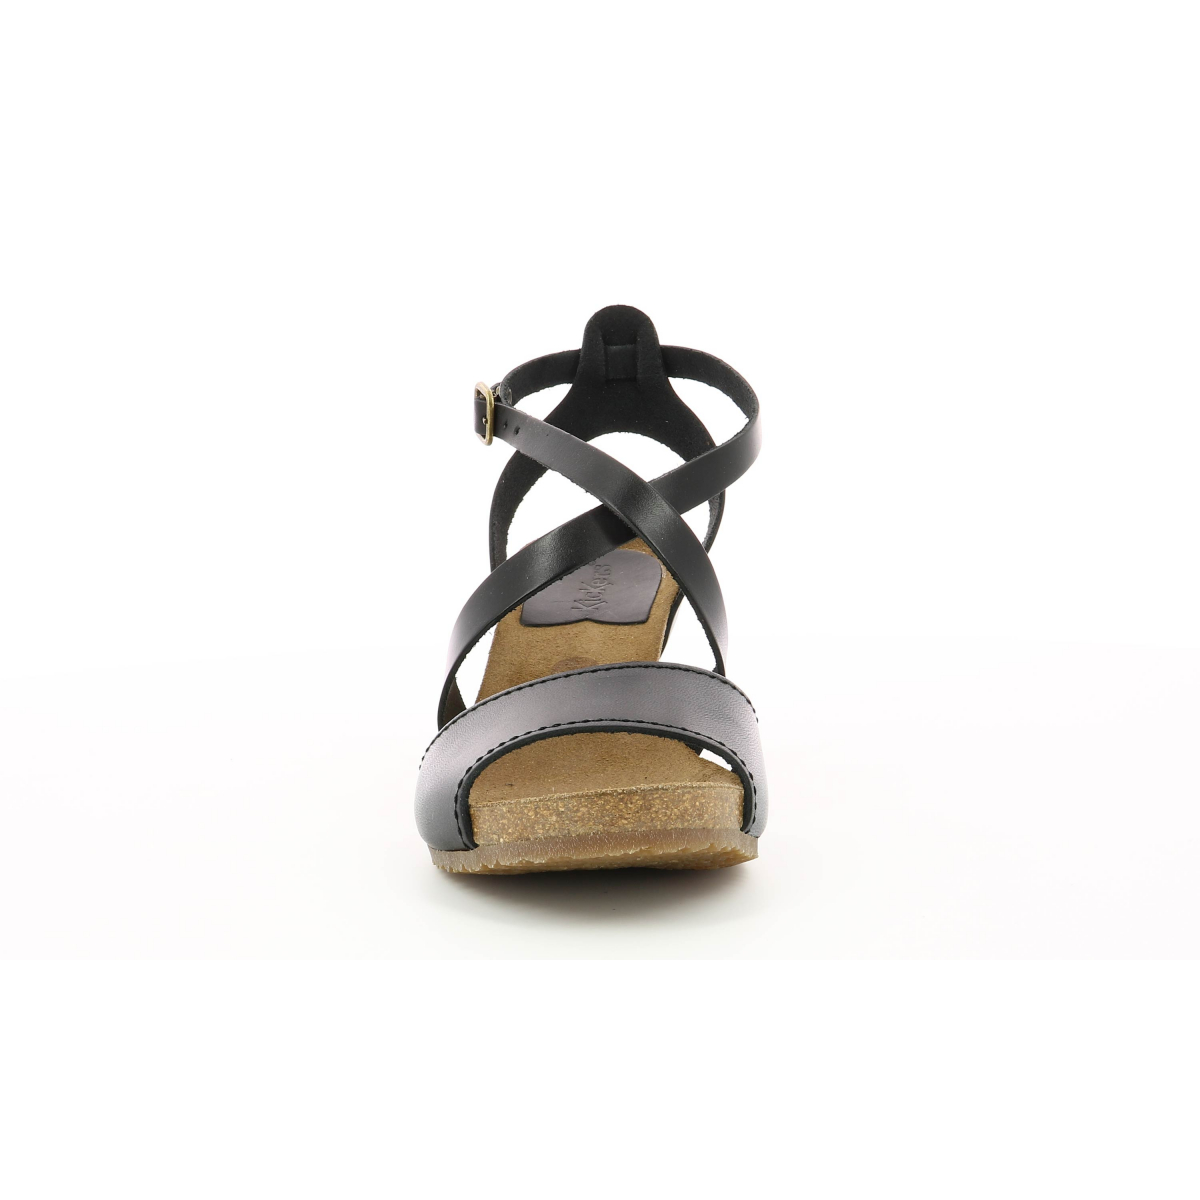 Femme Noir Femme Noir Spagnol Chaussures Spagnol Chaussures Kickers XPOZukiT